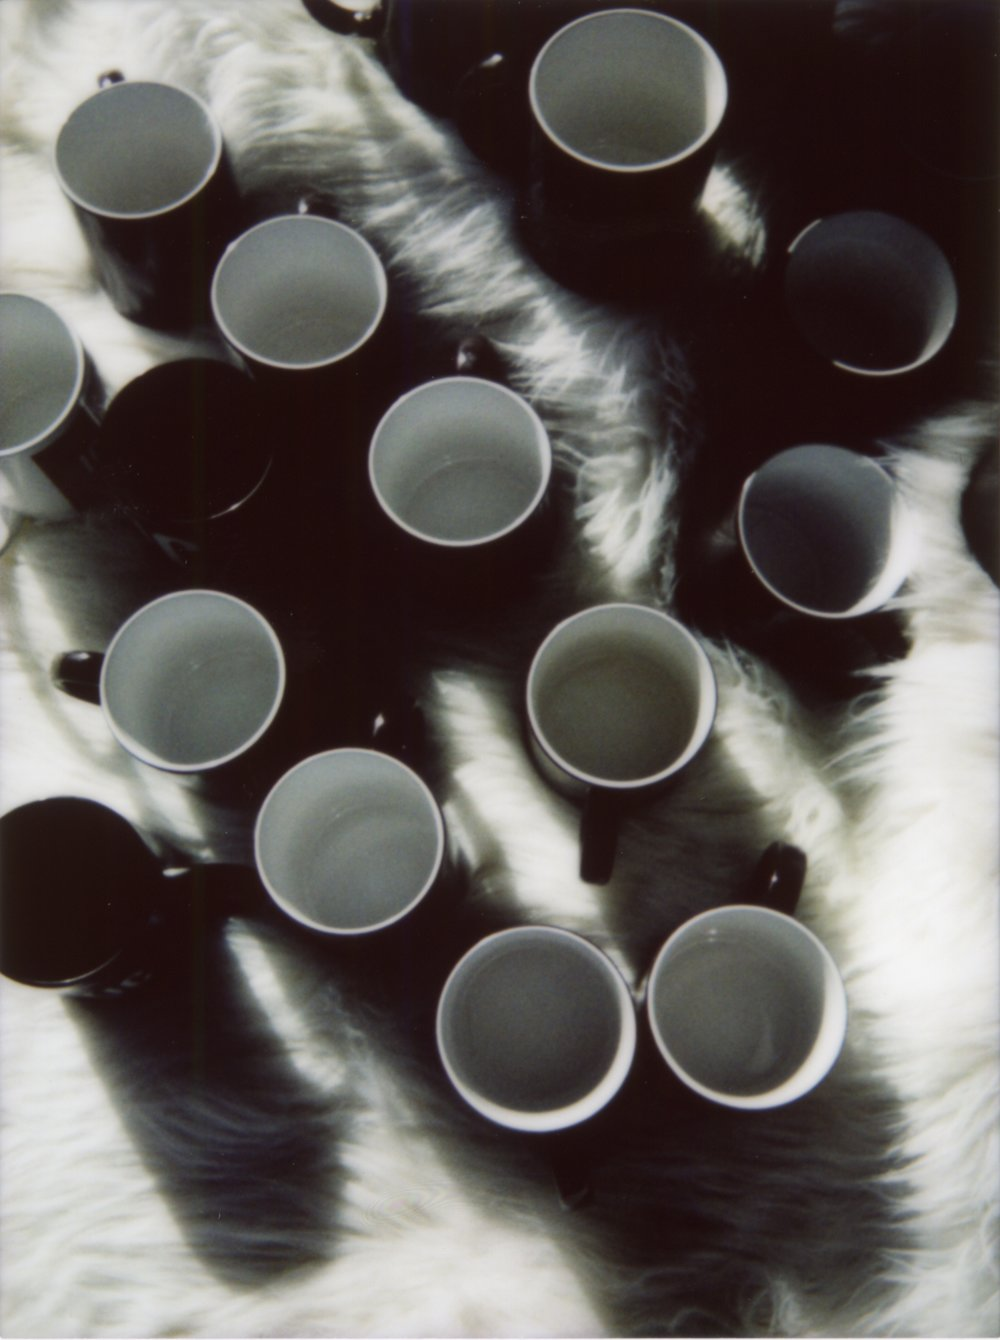 mug pics307.jpg